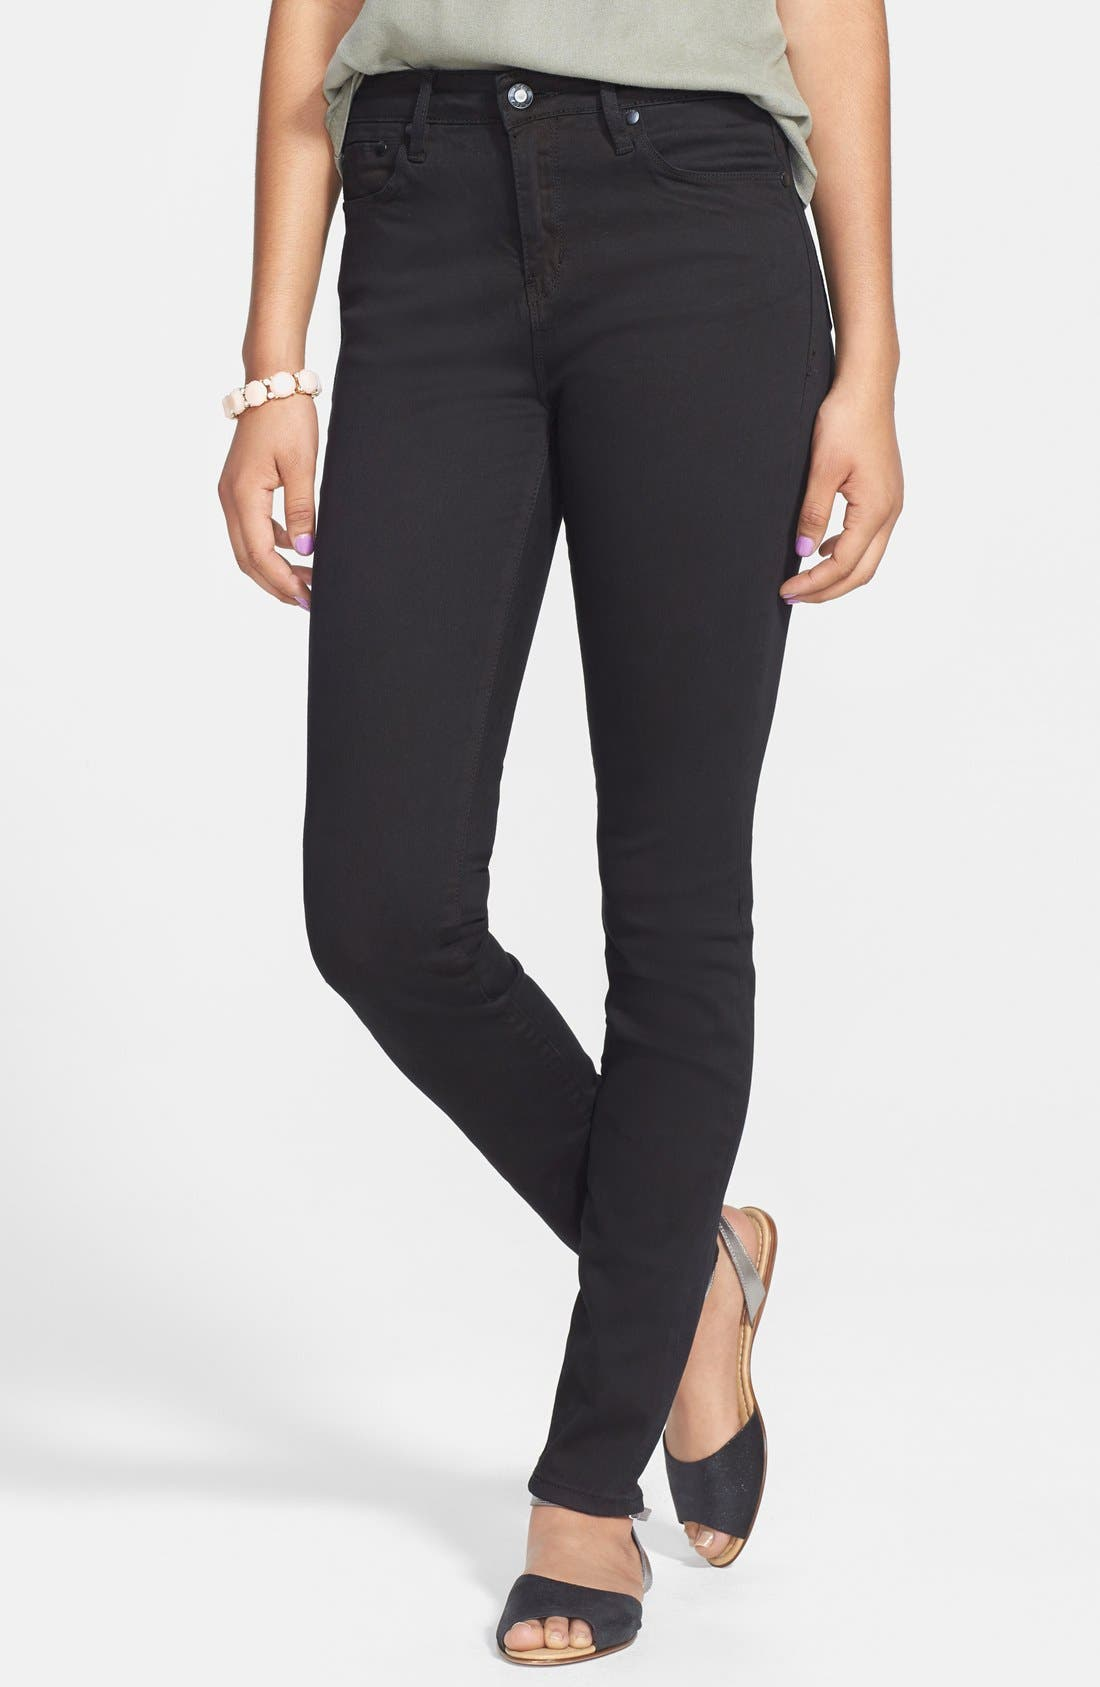 Alternate Image 1 Selected - THIS CITY High Waist Skinny Jeans (Black) (Juniors)